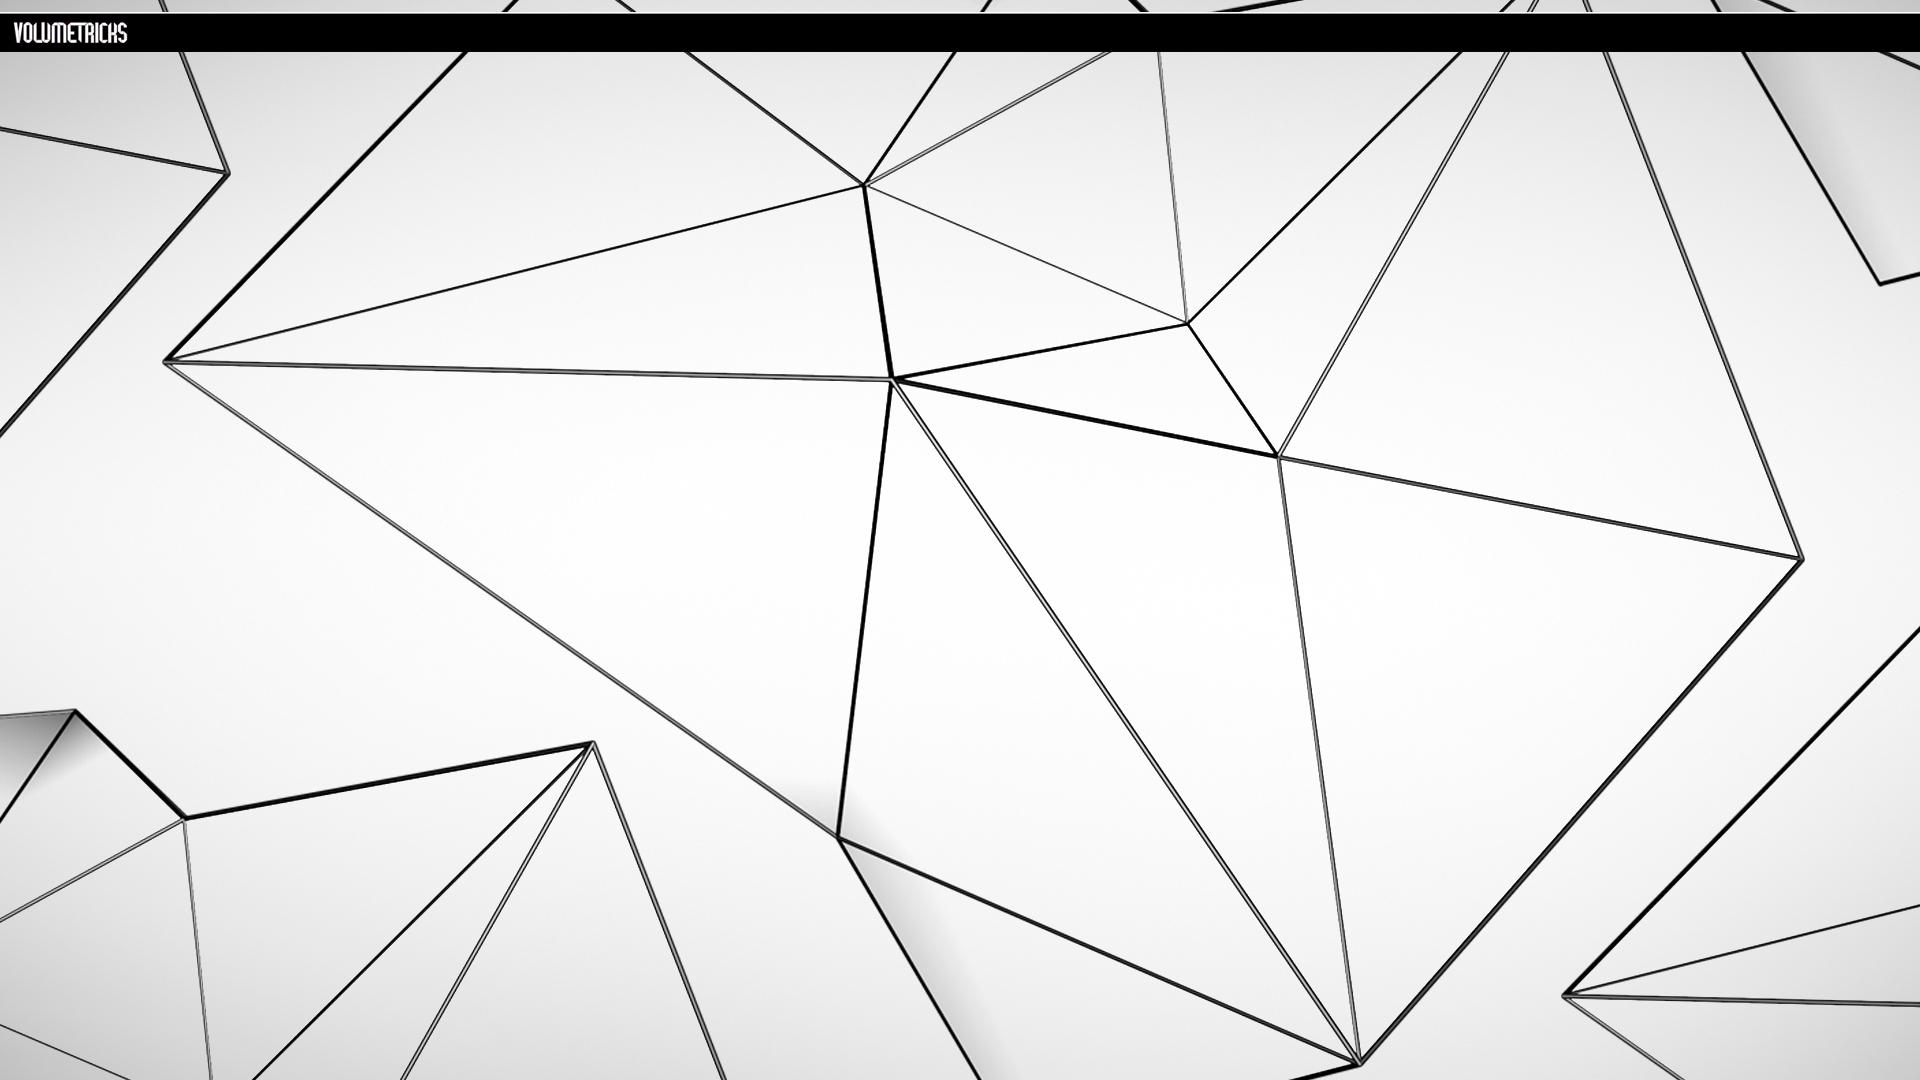 UltraLuminal Unlimited Mixing: 20 VJ Loops + 20 Alpha Elements + 30 VJ  Backgrounds